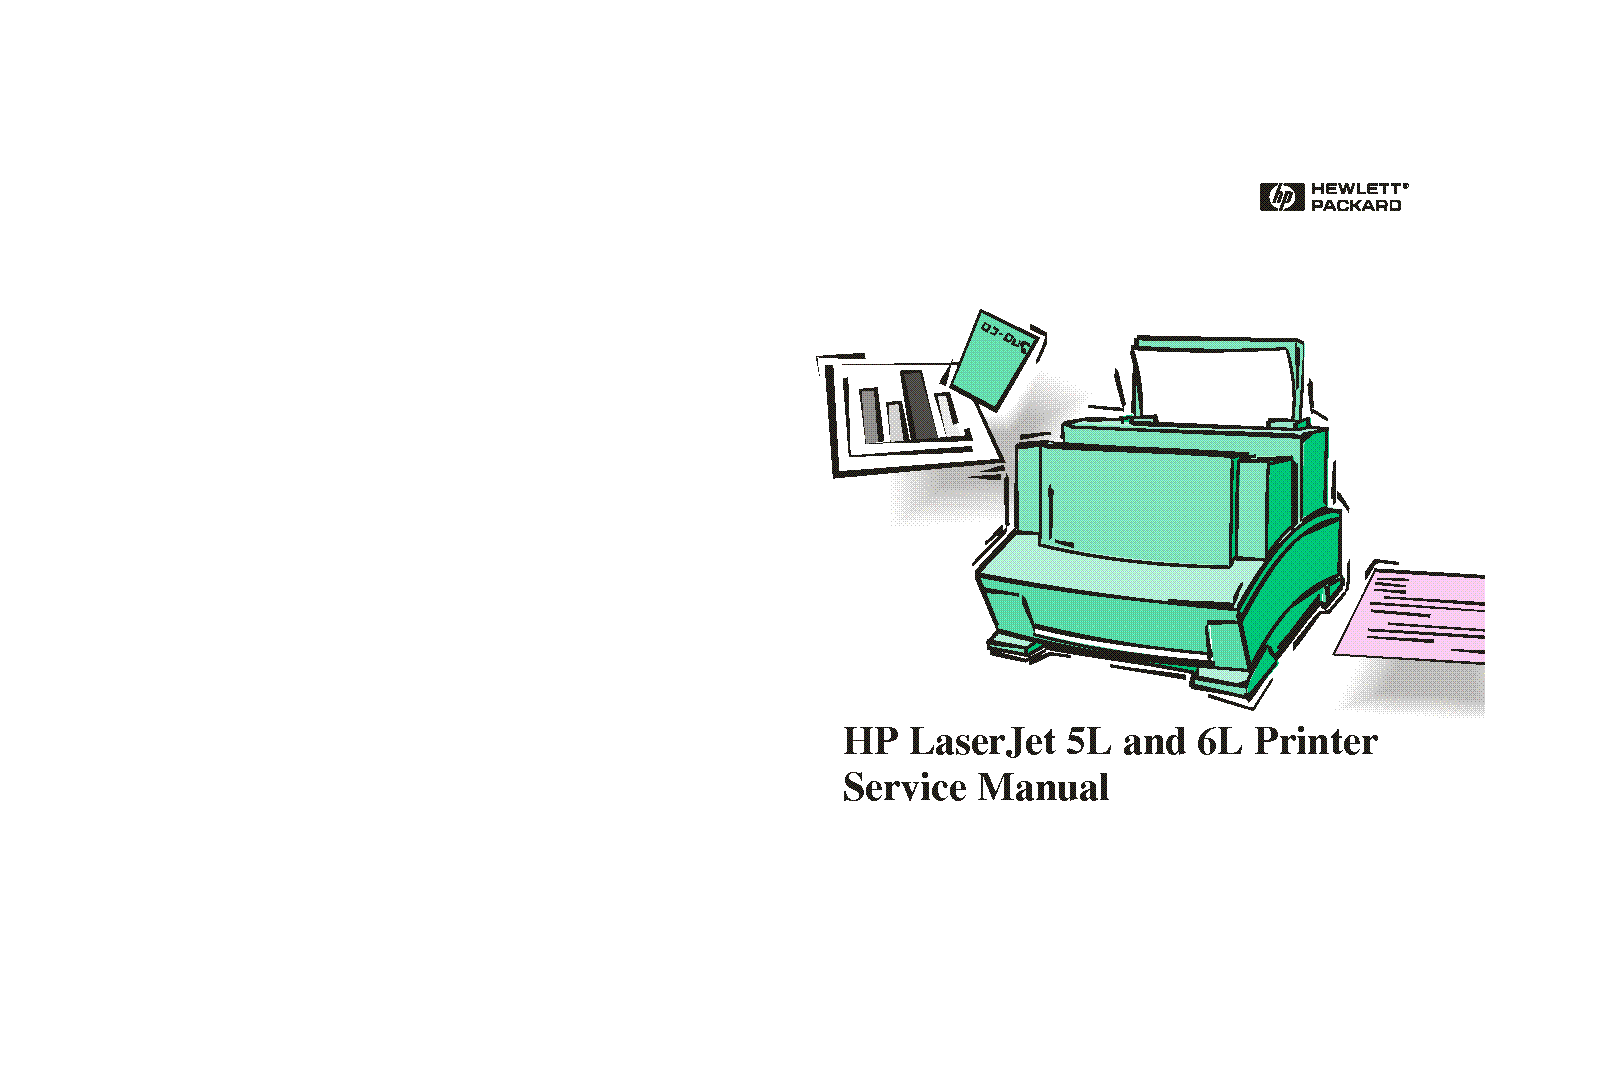 hp laserjet 5l 6l service manual service manual download schematics rh elektrotanya com hp laserjet p2055dn manual service hp laserjet 1300 manual service